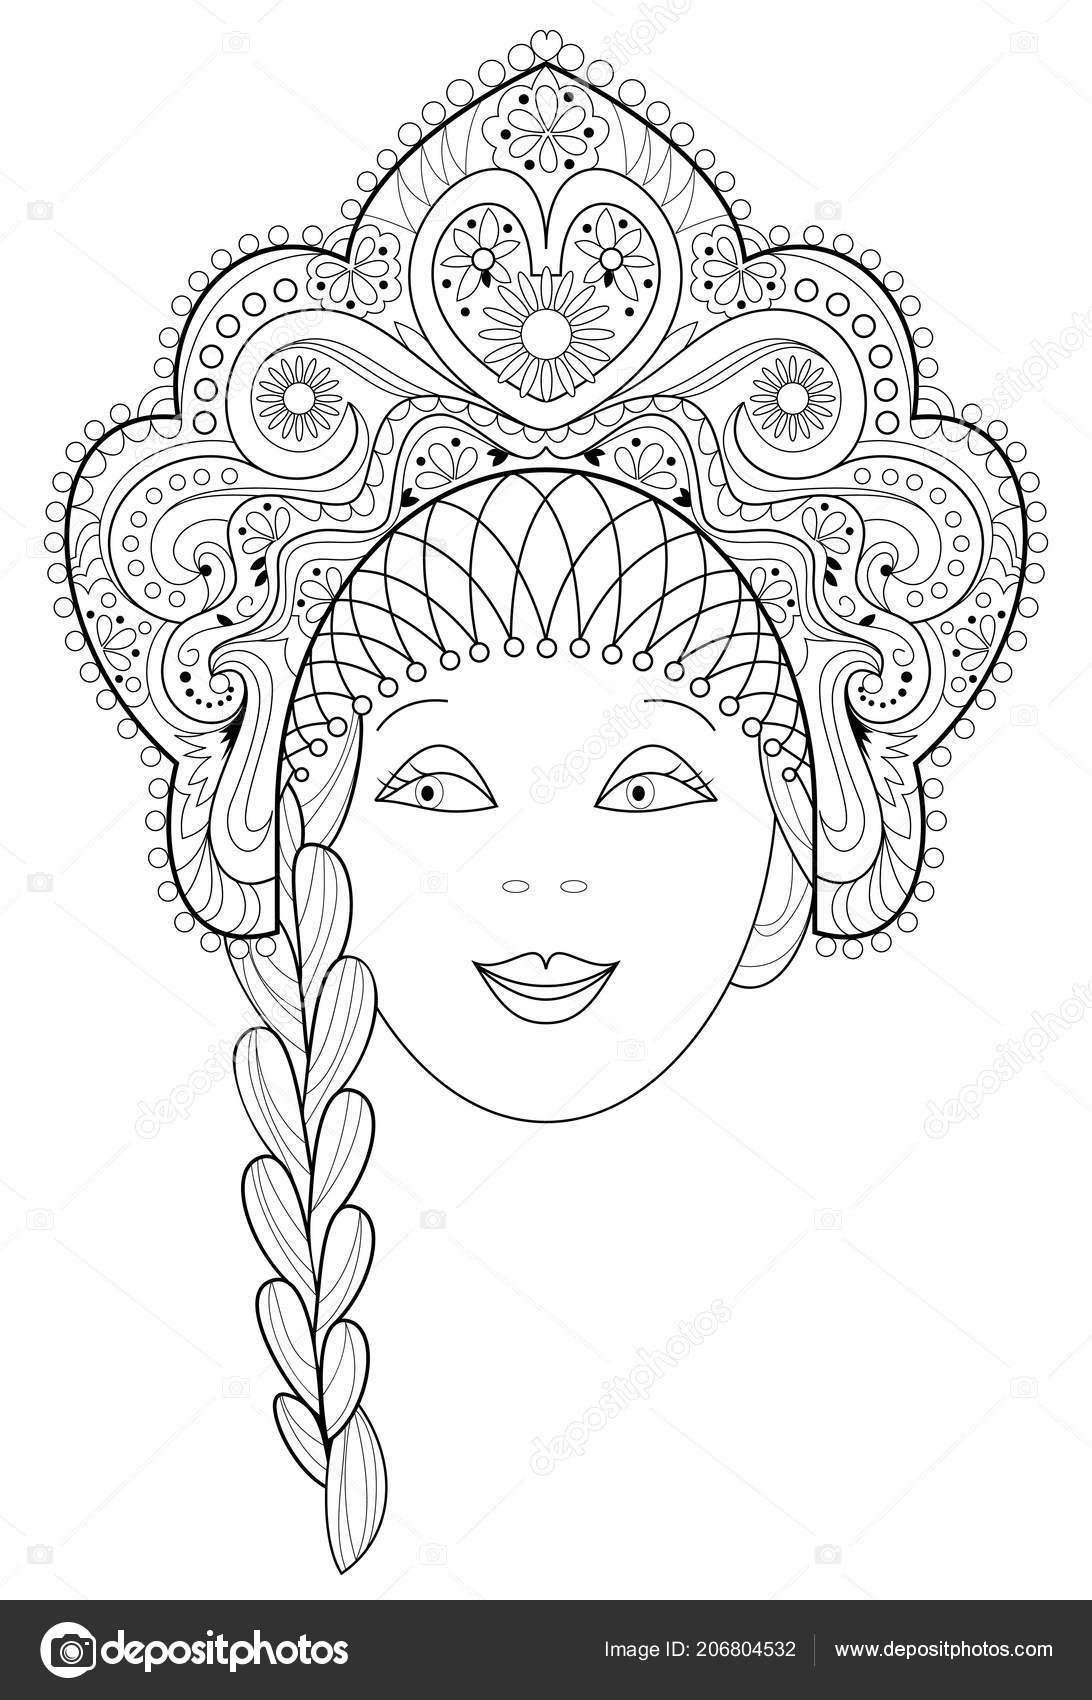 Page Noir Blanc Colorier Dessin Visage Femme Belle Coiffure Folk